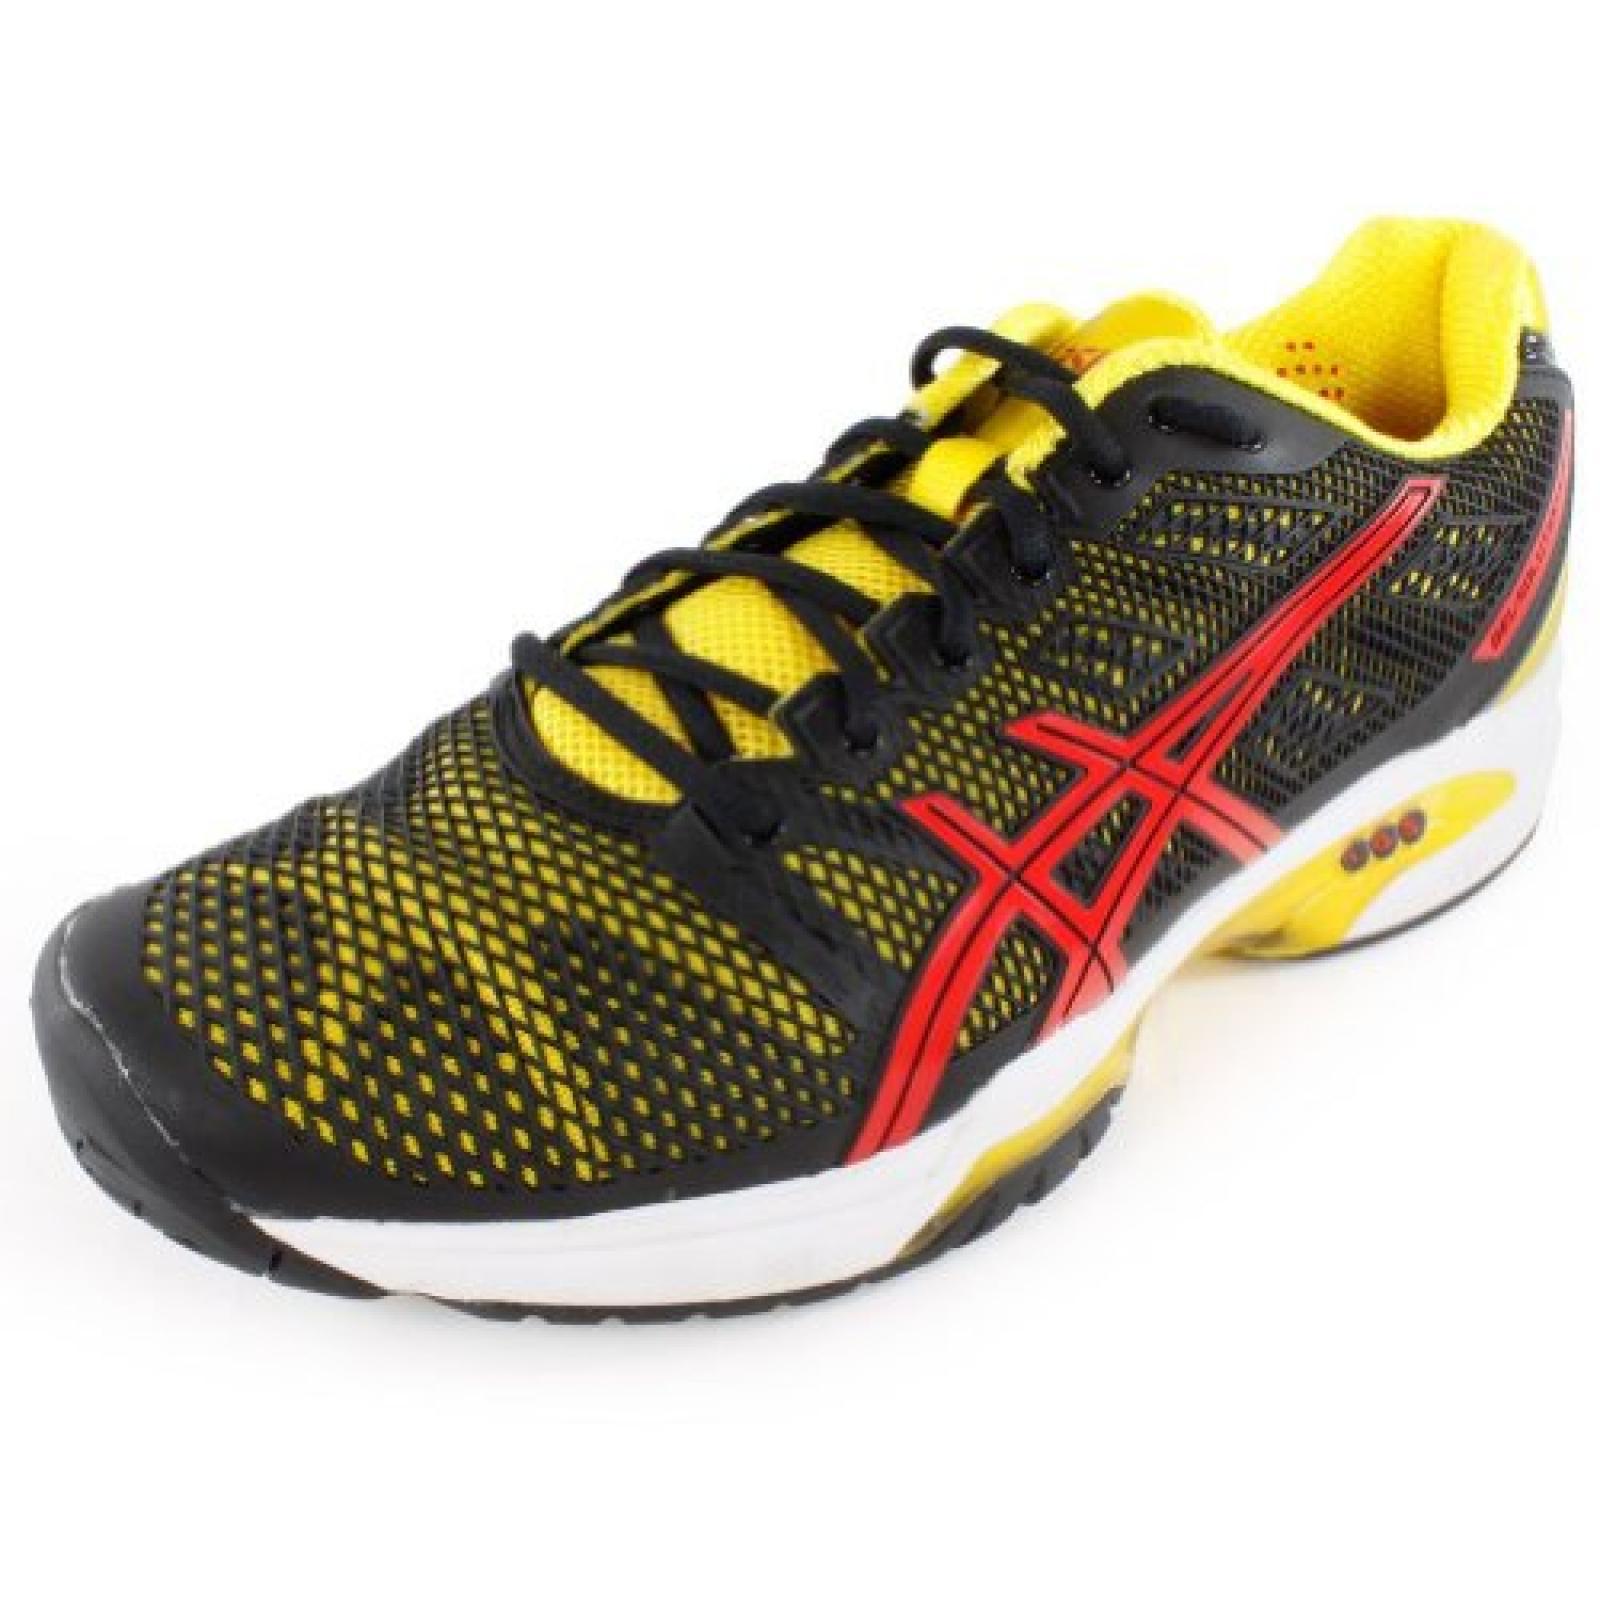 Asics - Herren Gel-Solution Speed 2 Tennis-Schuhe